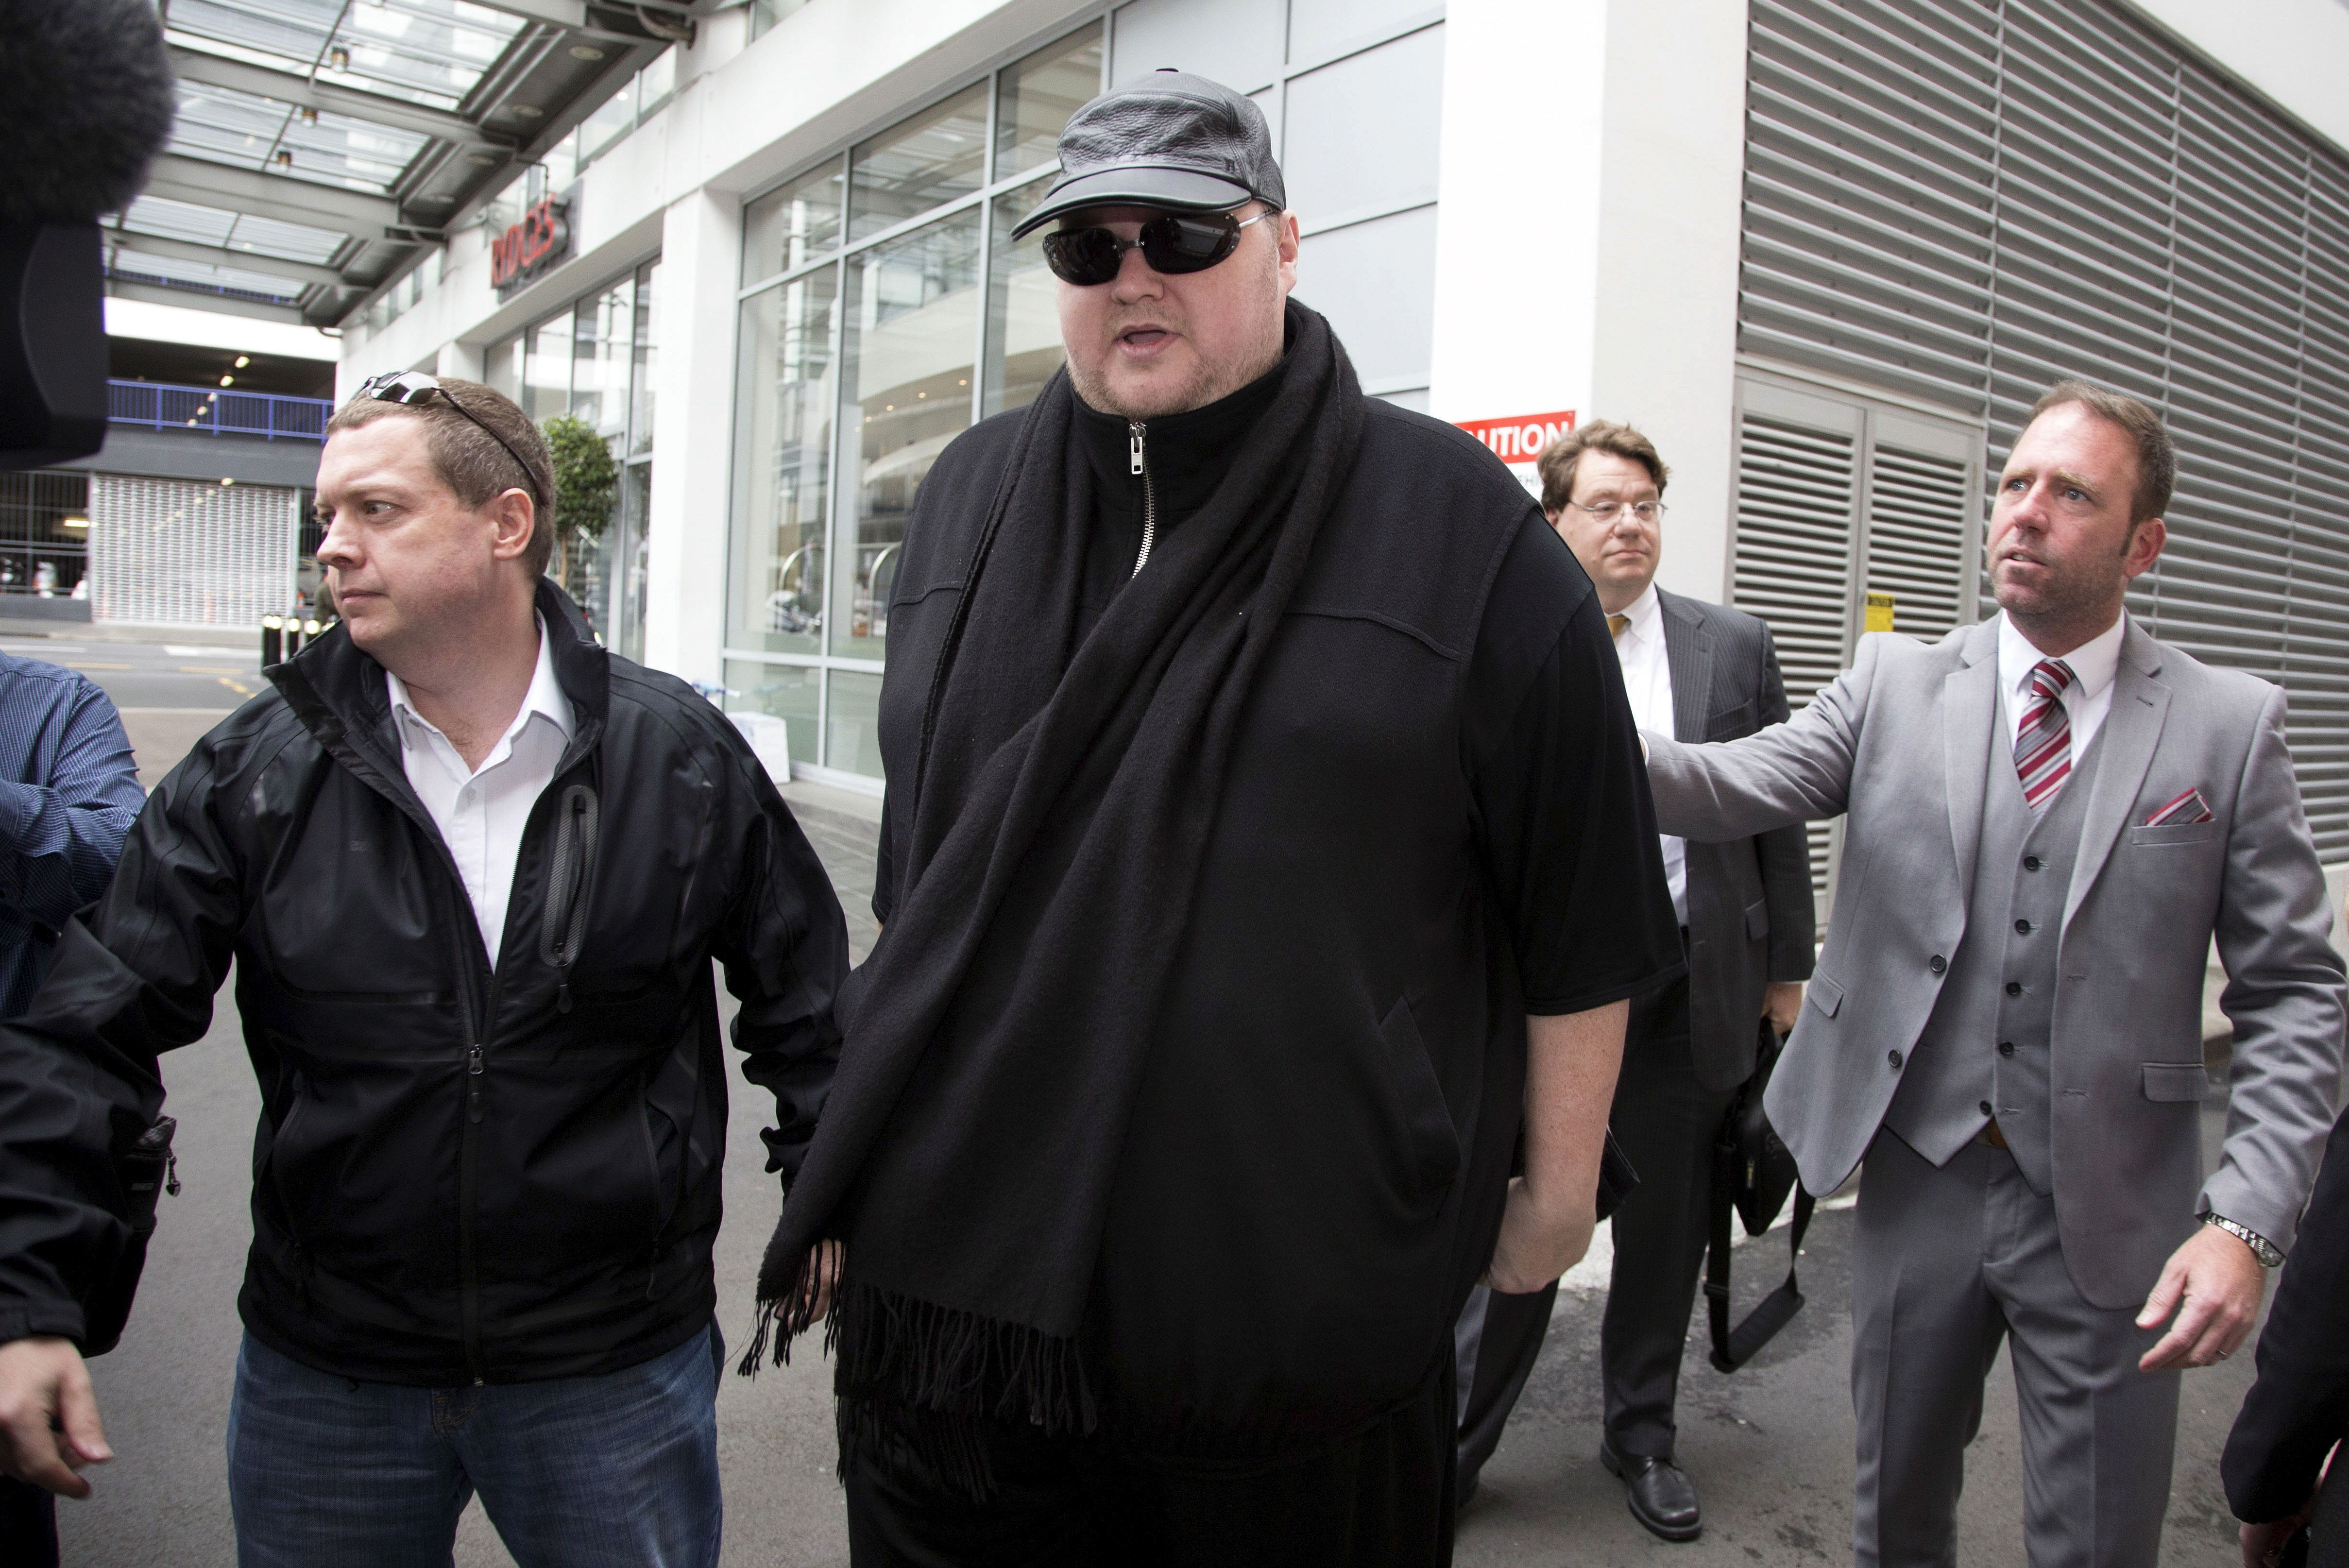 German tech entrepreneur Kim Dotcom arriving for a court hearing in Auckland, New Zealand, September 24, 2015.